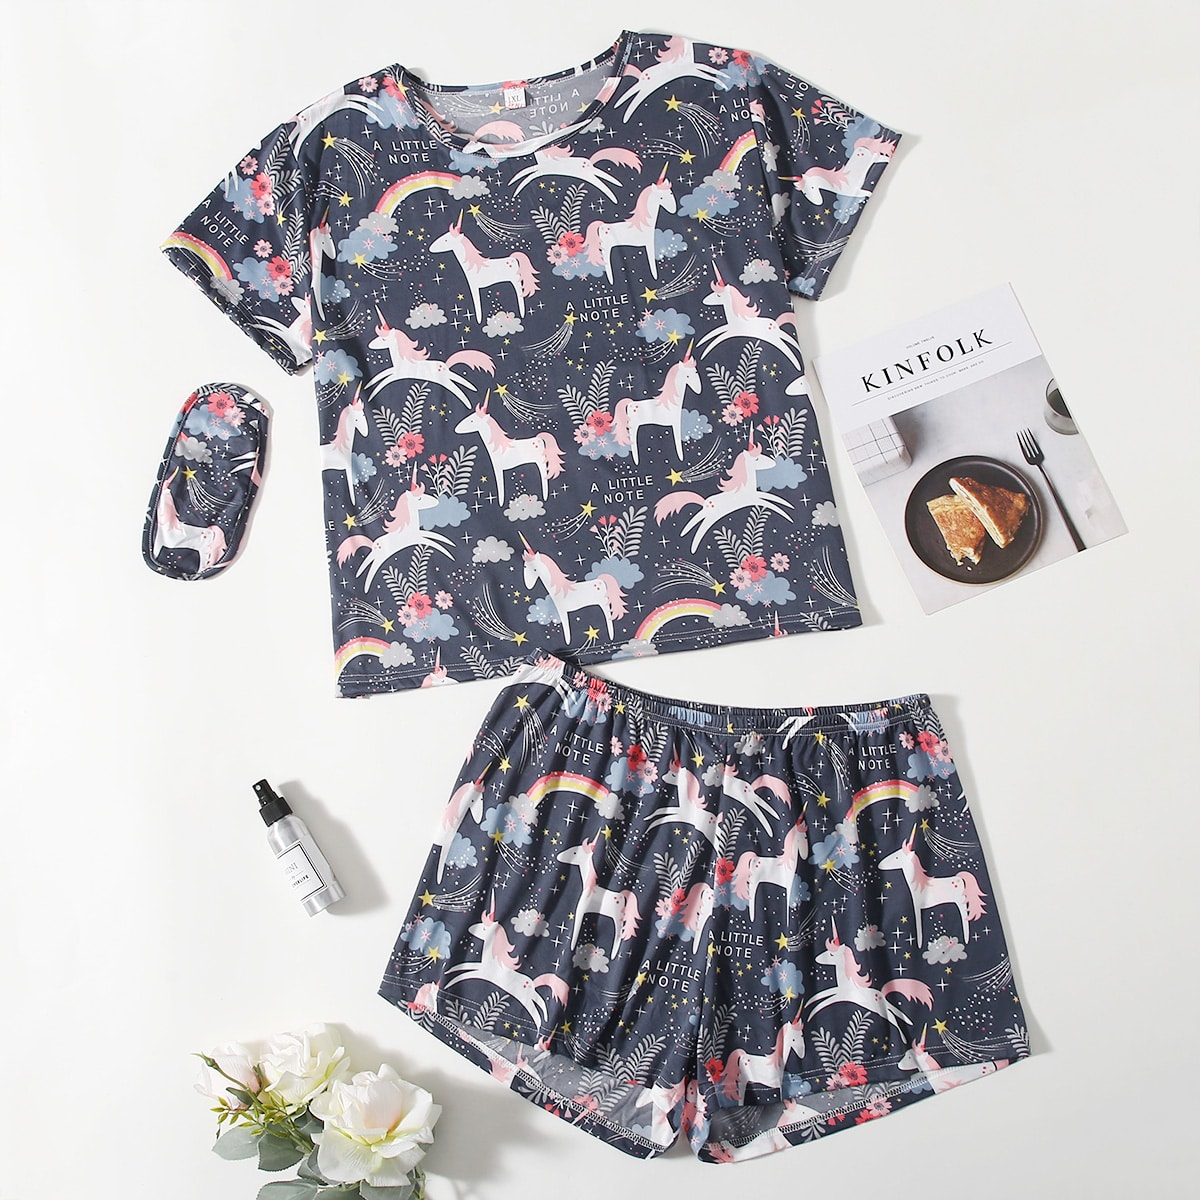 shein Schattig Spotprent Grote maten pyjama sets